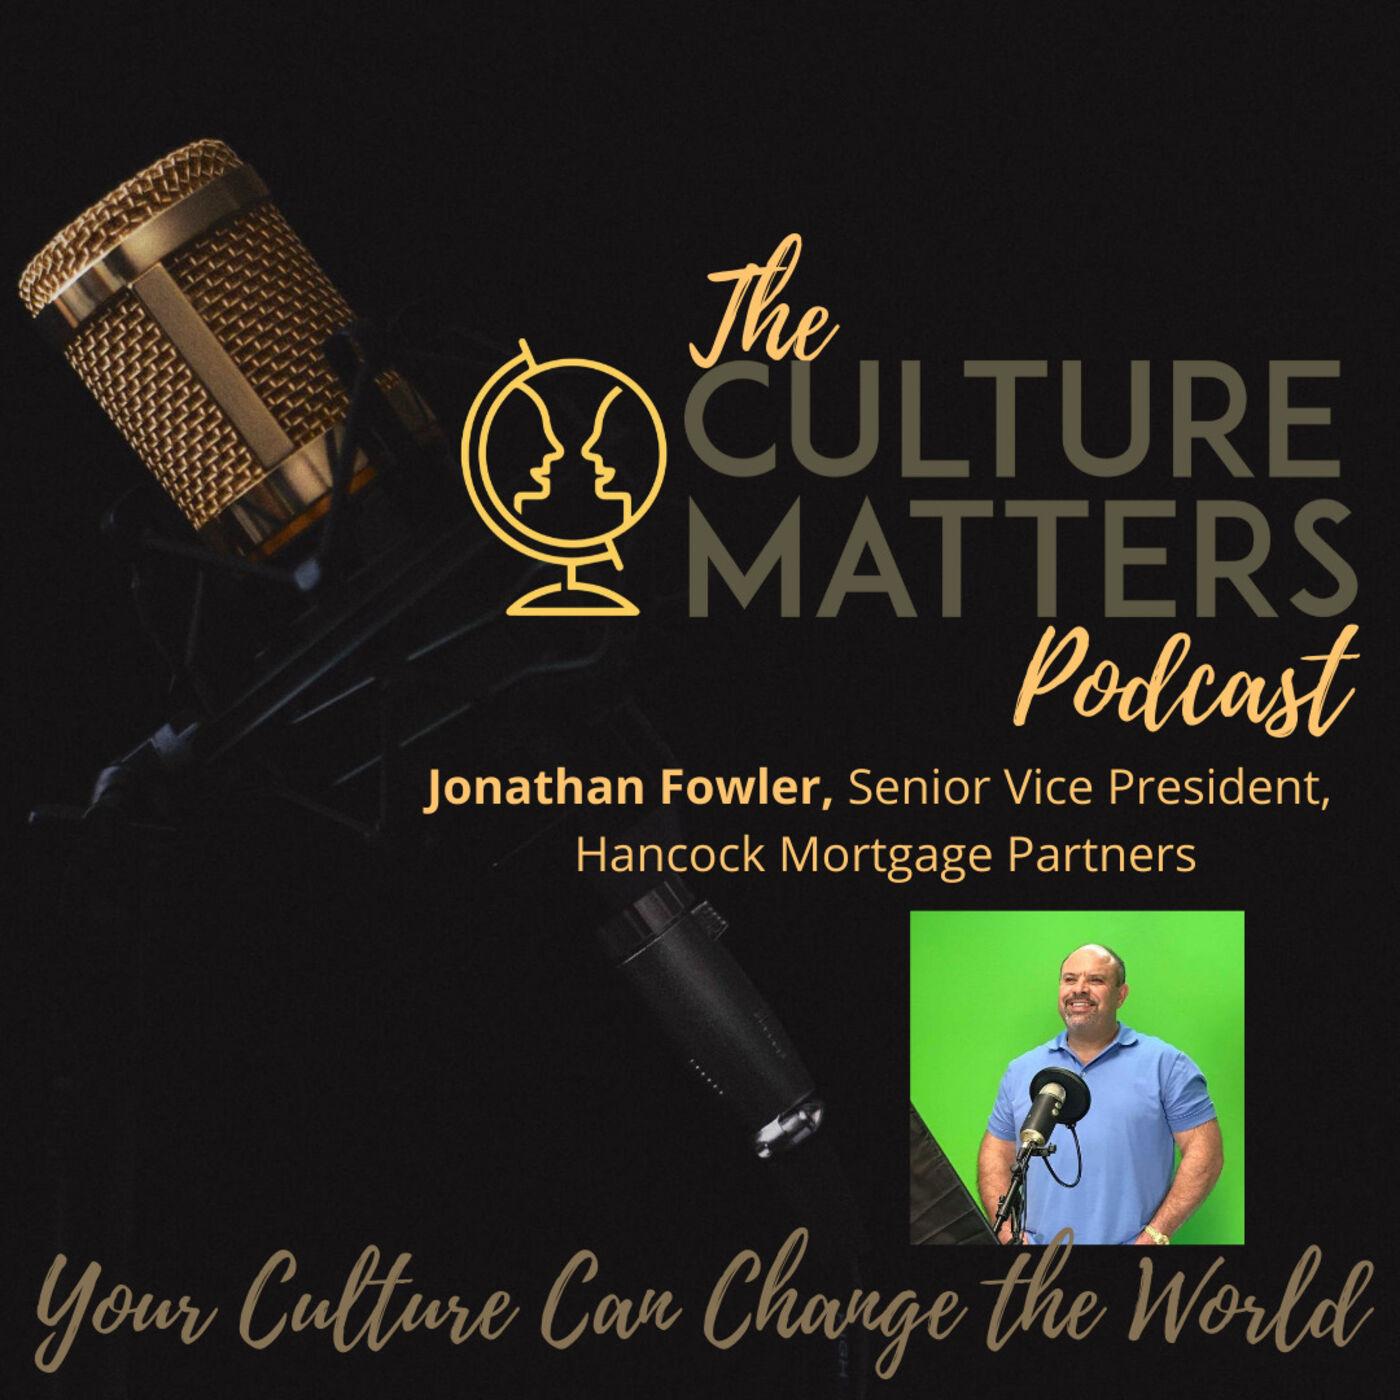 Season 6, Episode 66: Guest: Jonathon Fowler: The Gift of Giving